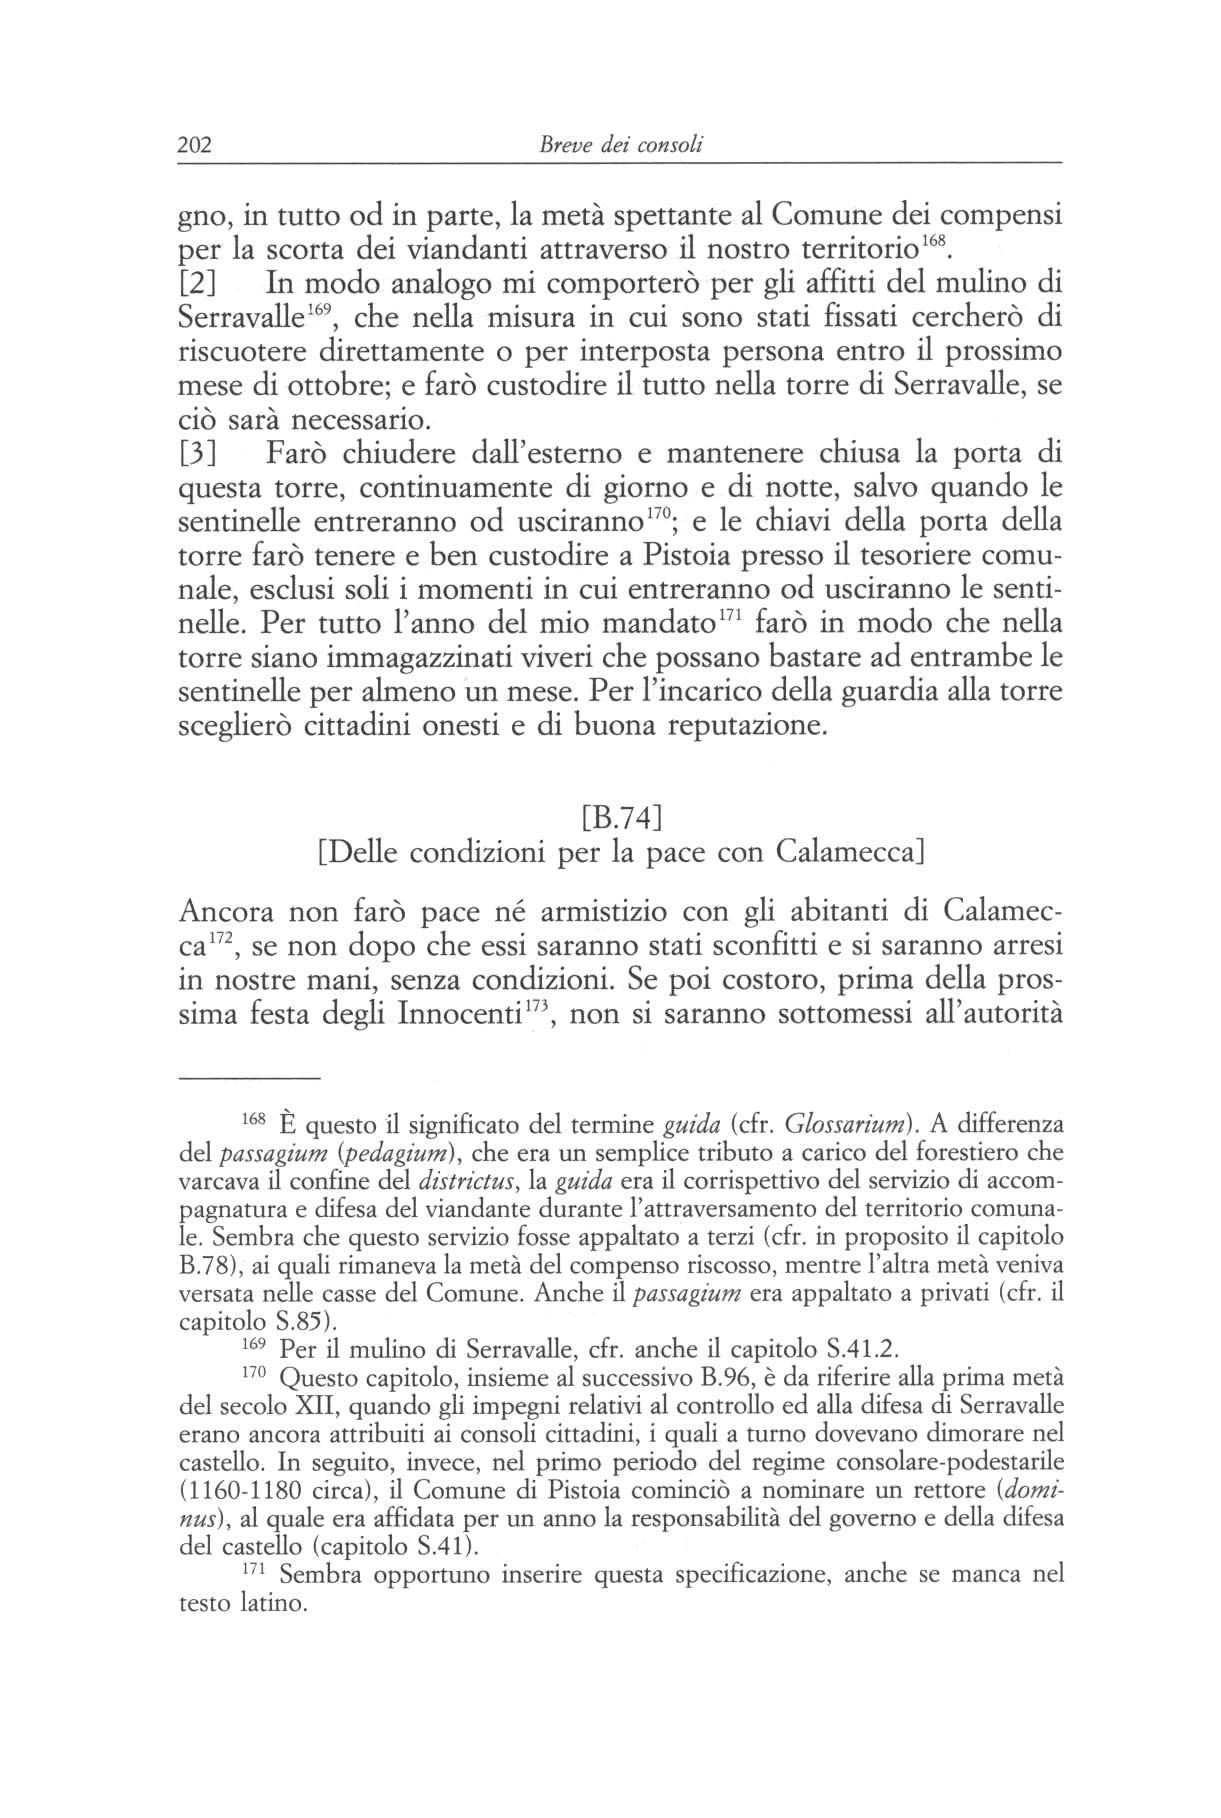 statuti pistoiesi del sec.XII 0202.jpg